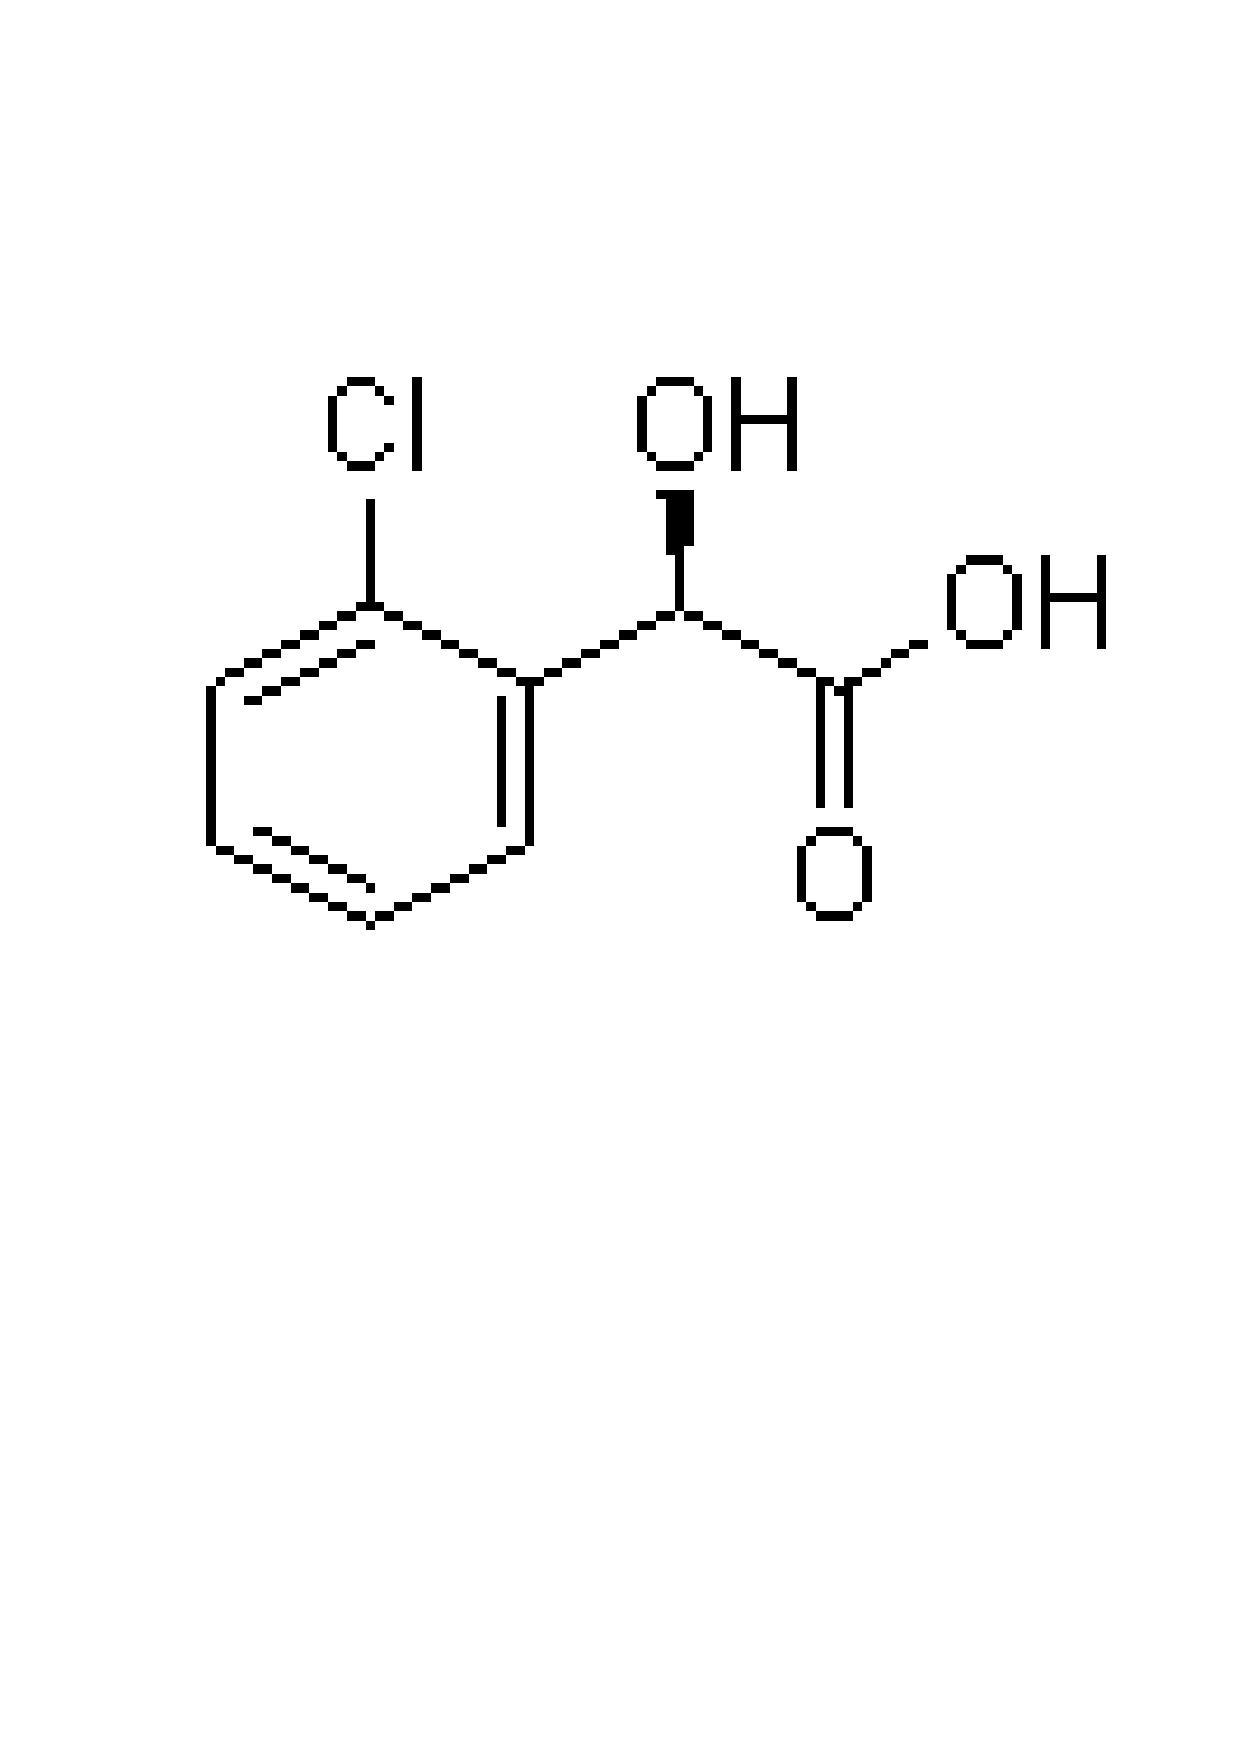 1-Boc-4-哌啶甲酸